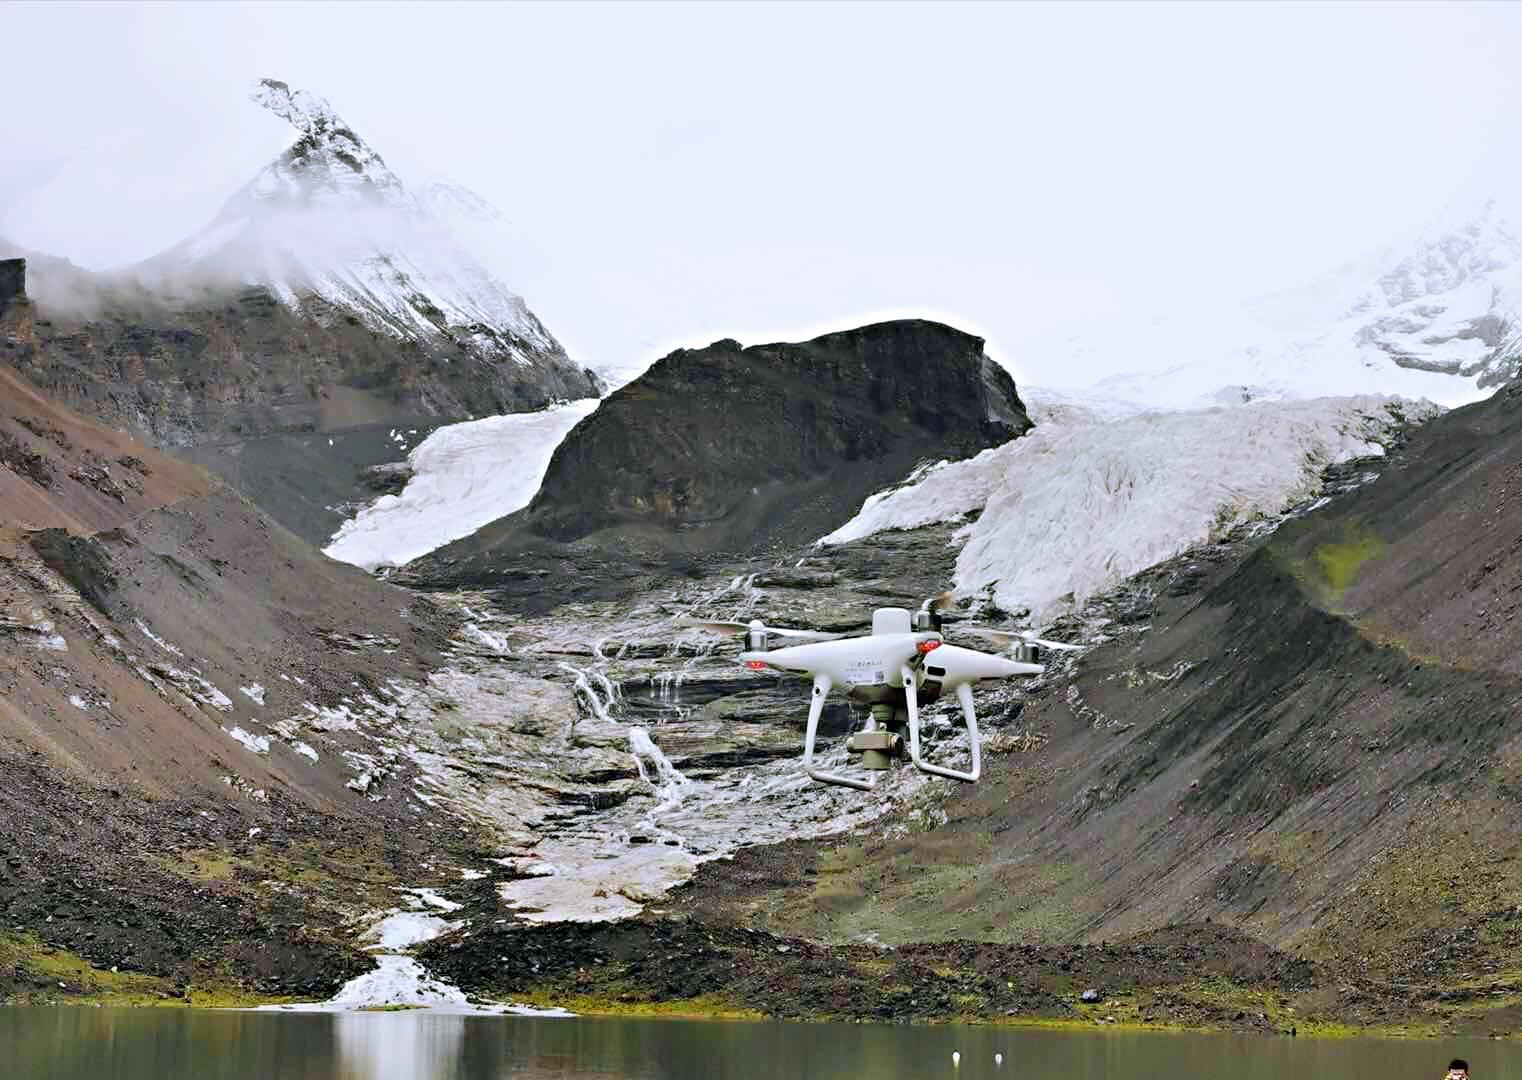 ESS studies impact of climate change on Qinghai-Tibet Plateau